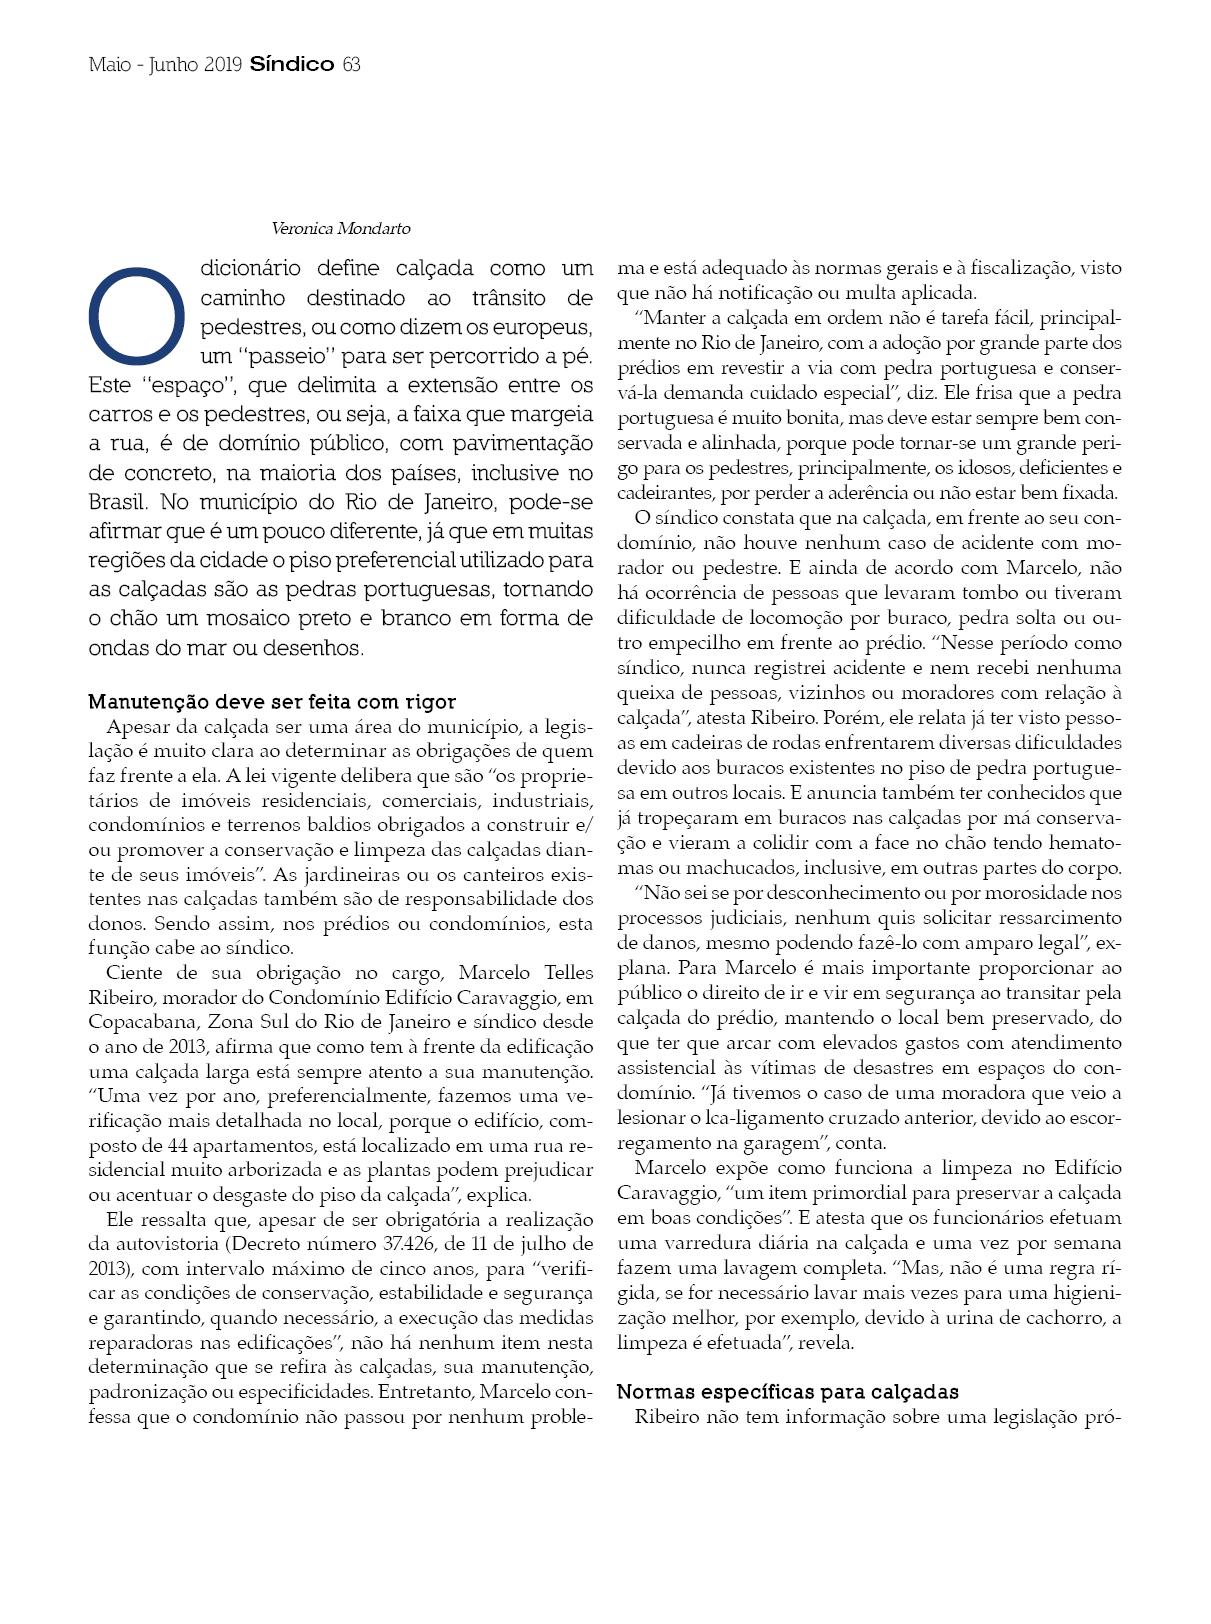 Revista Síndico_ed24461